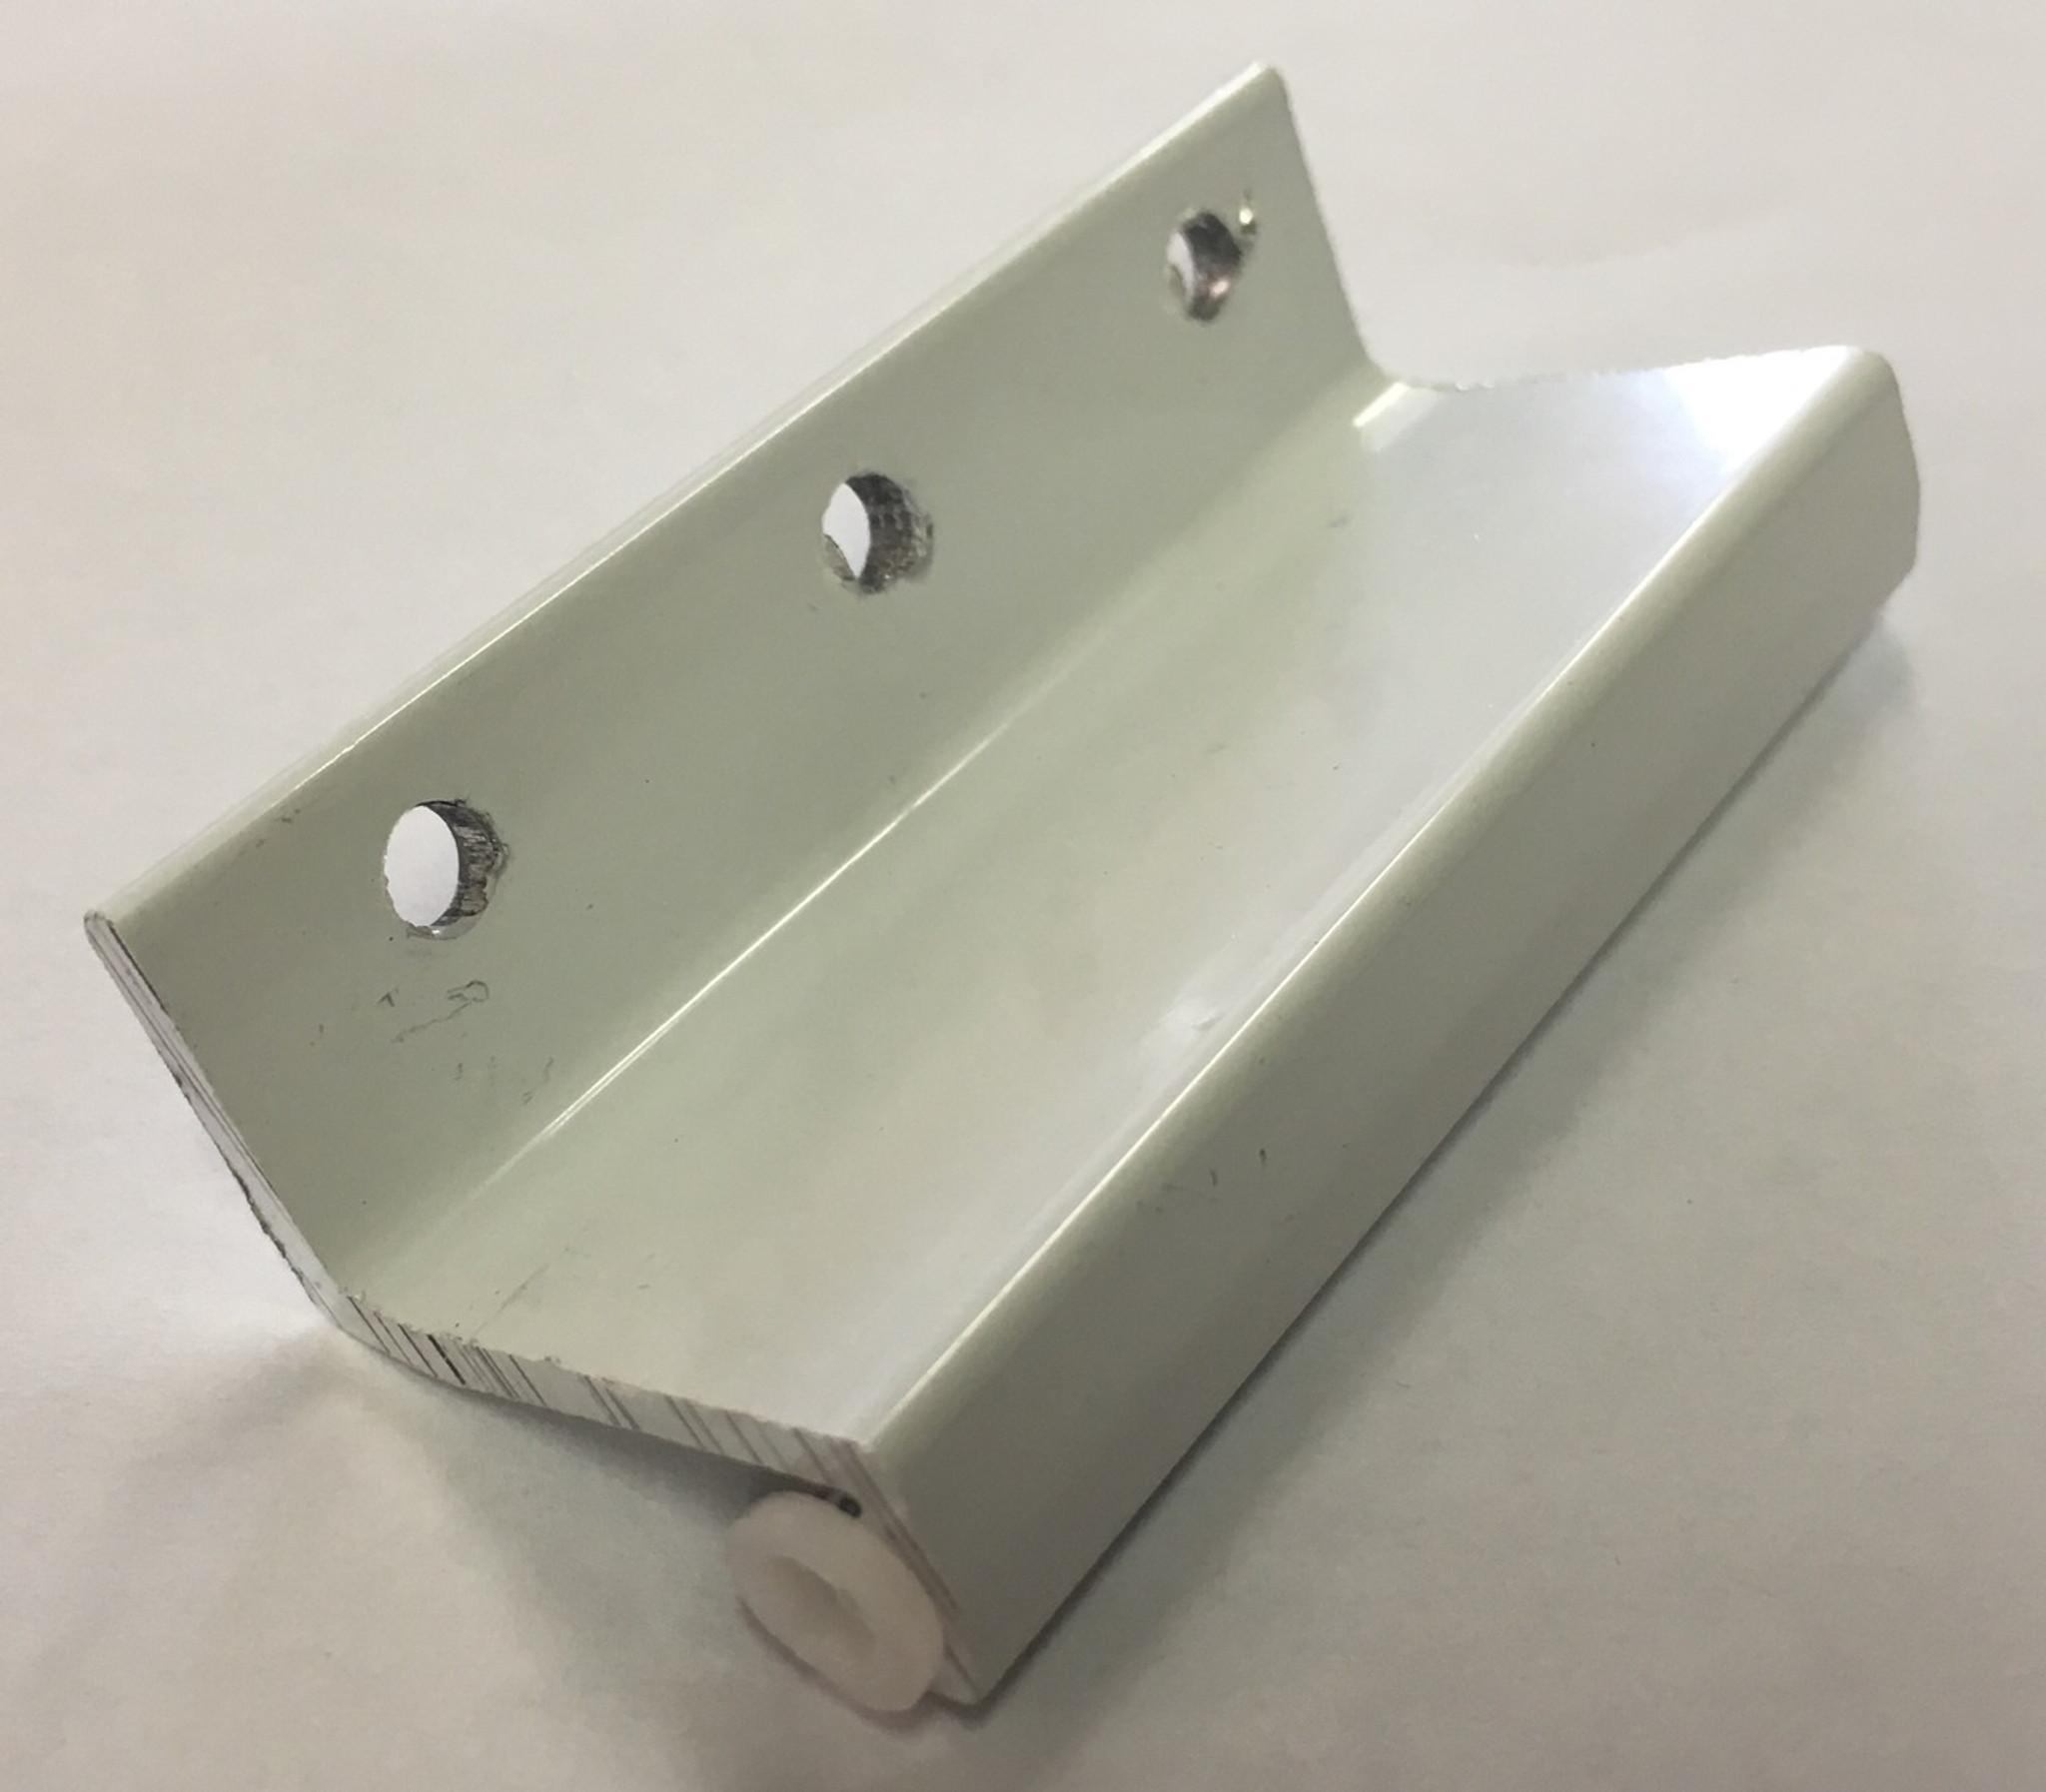 Elixir Exterior Door Hinge White (4 Pack) - H & S Mobile Home Supplies